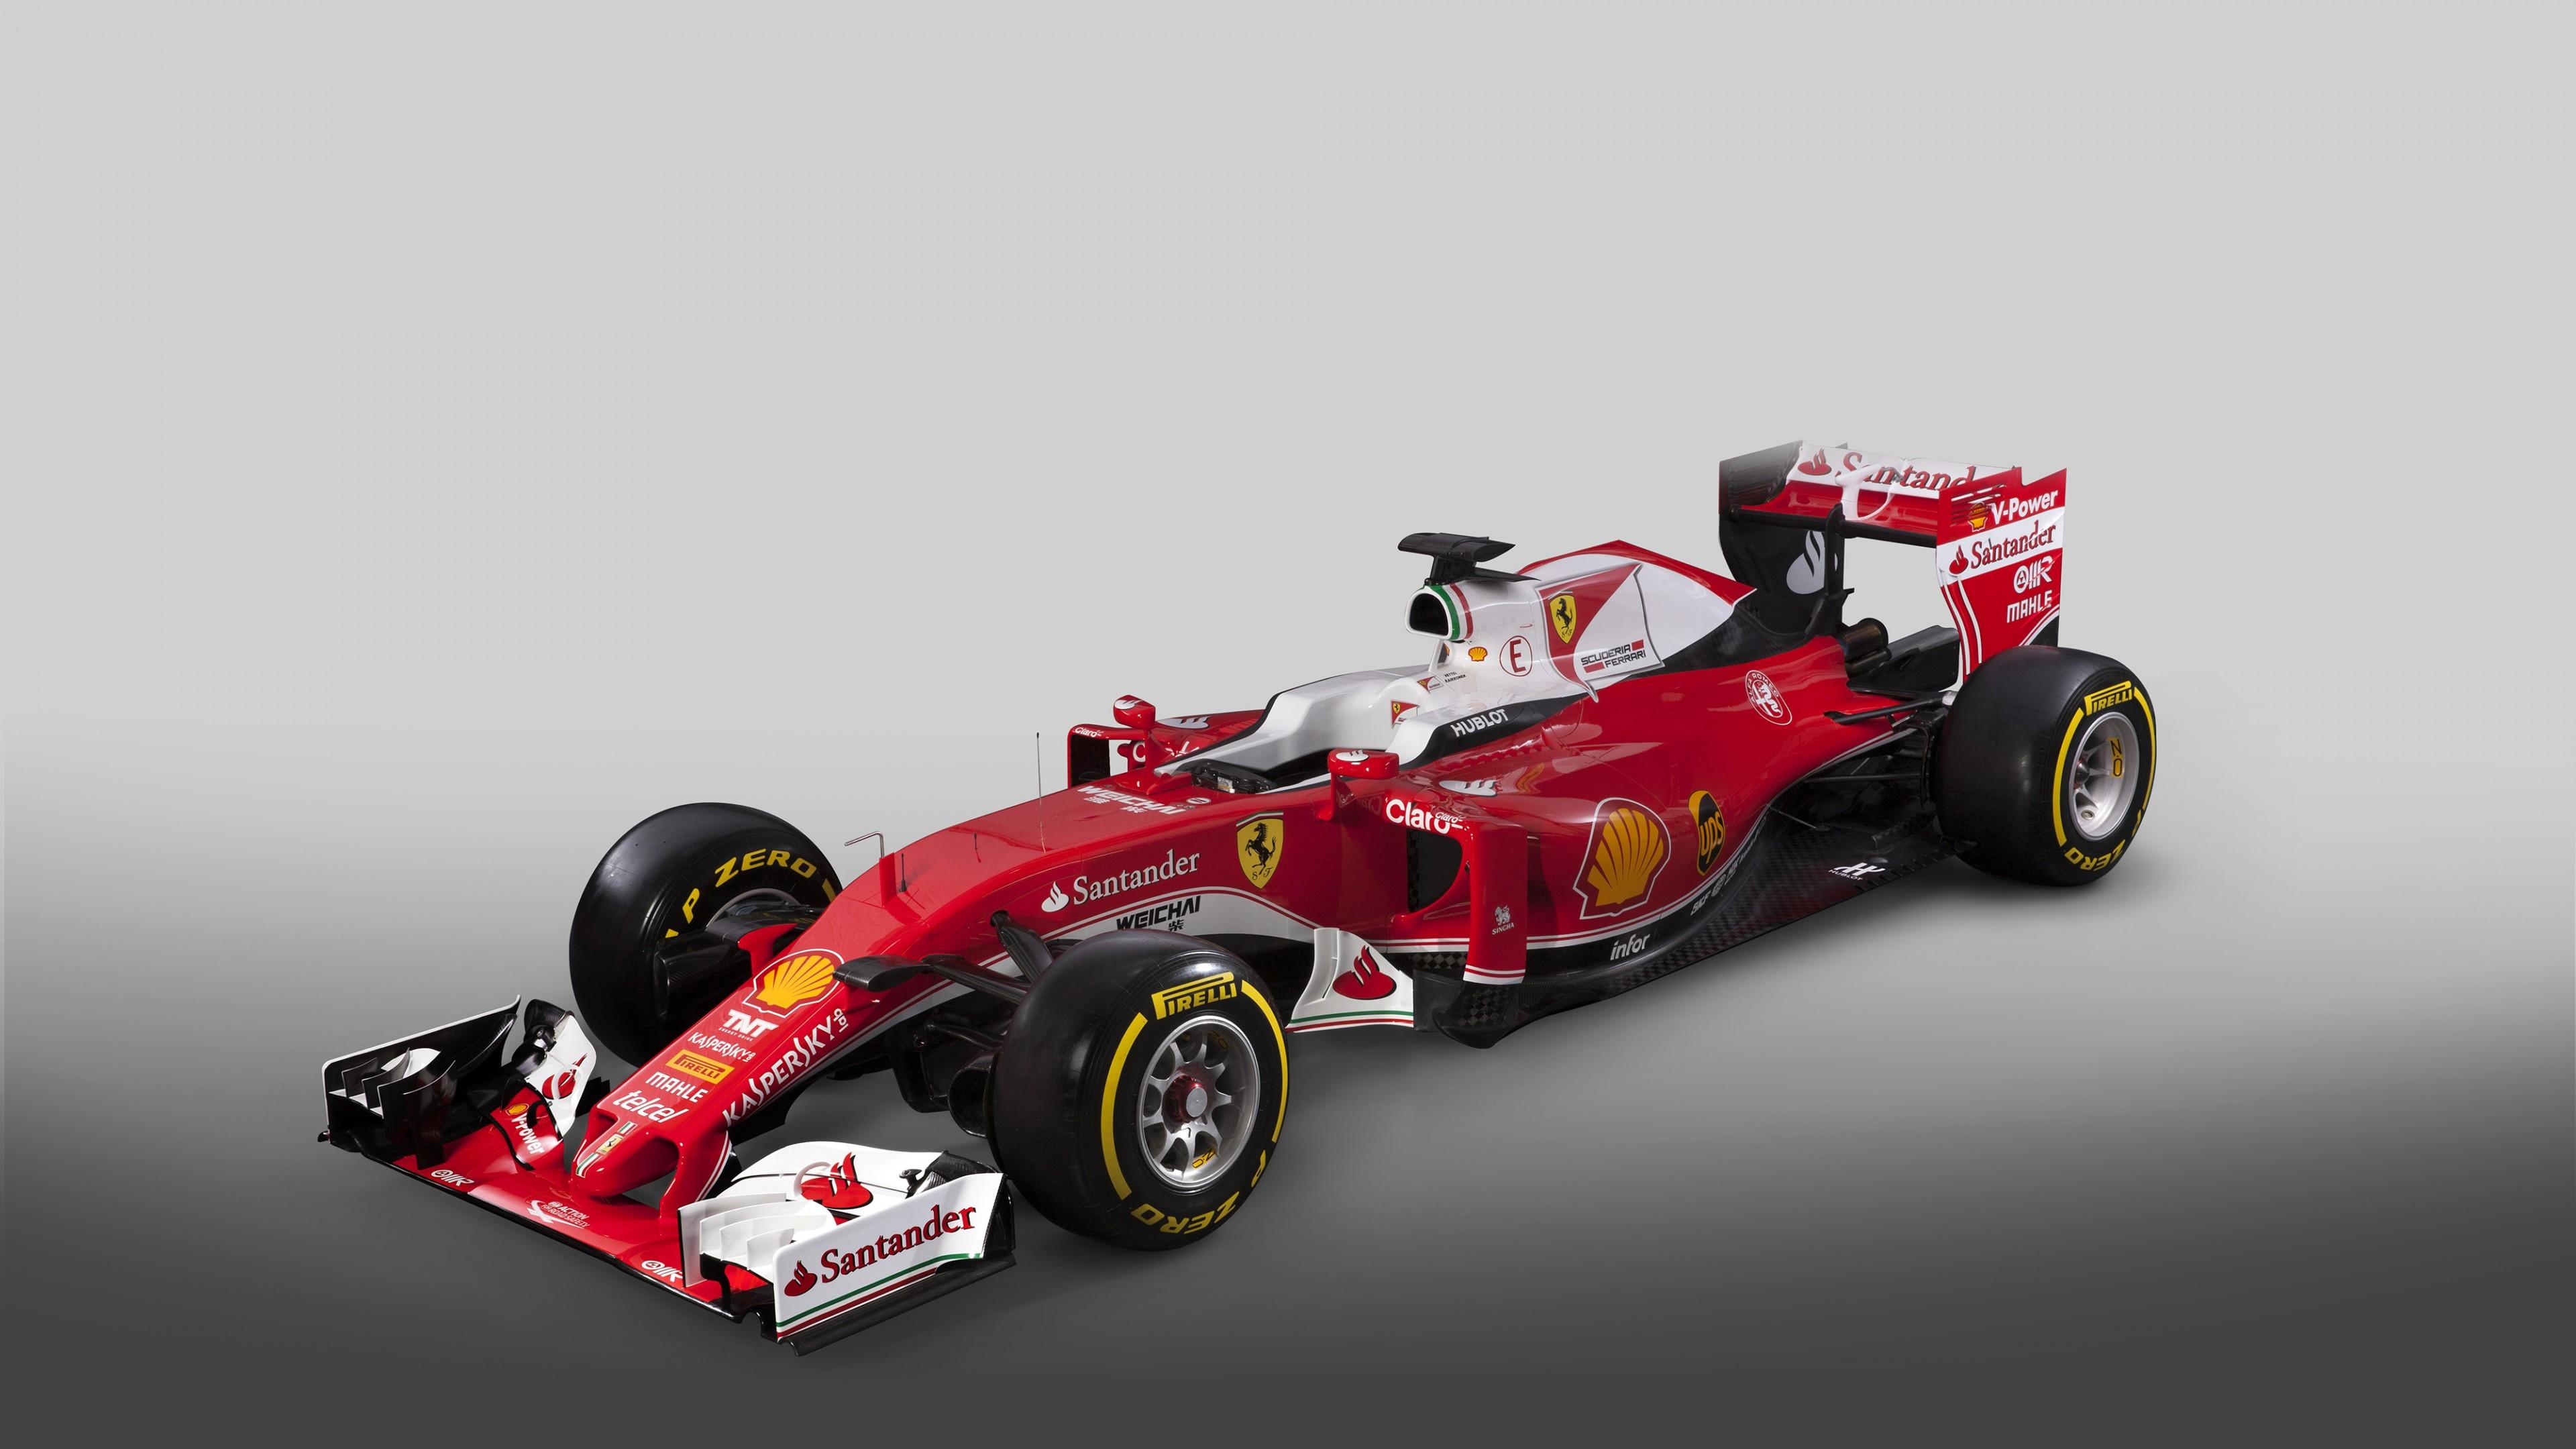 Foto Wallpaper Ferrari Sf16 H Formula 1 F1 Red Cars